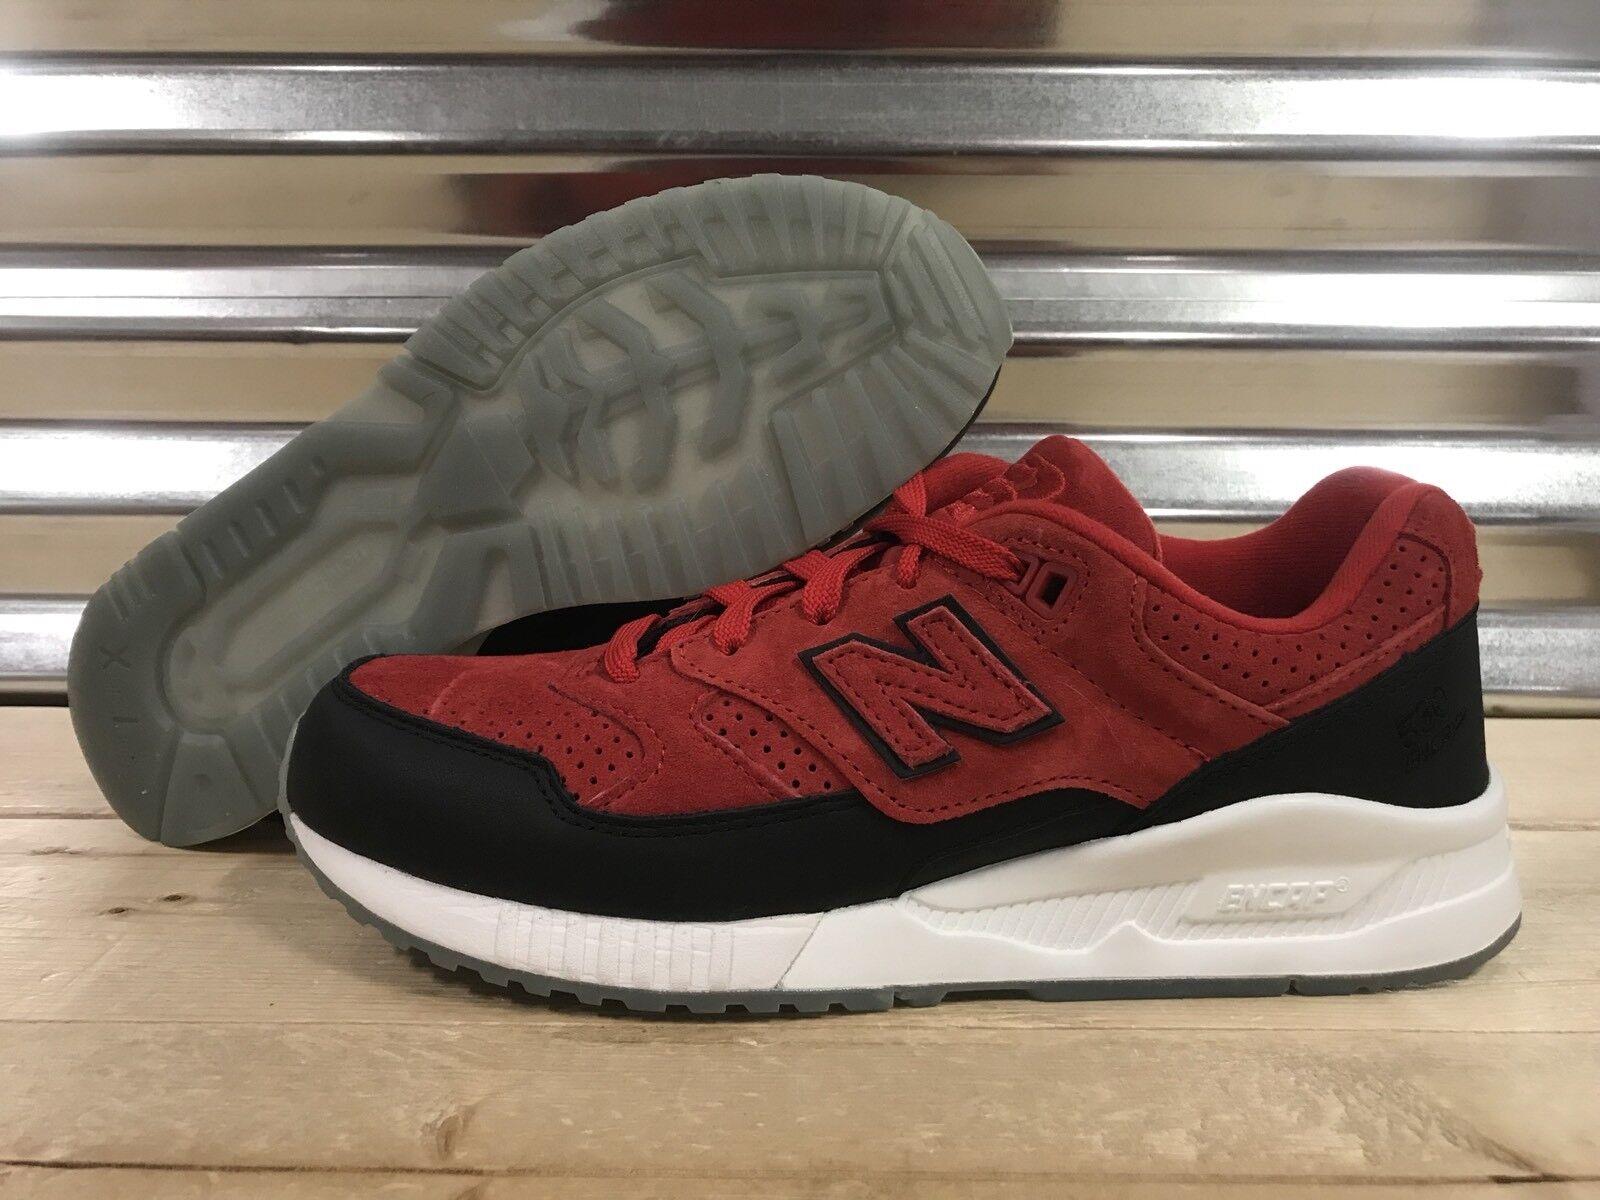 New Balance 530 ENCAP Running shoes Suede Red Black SZ 7 ( M530CBB )